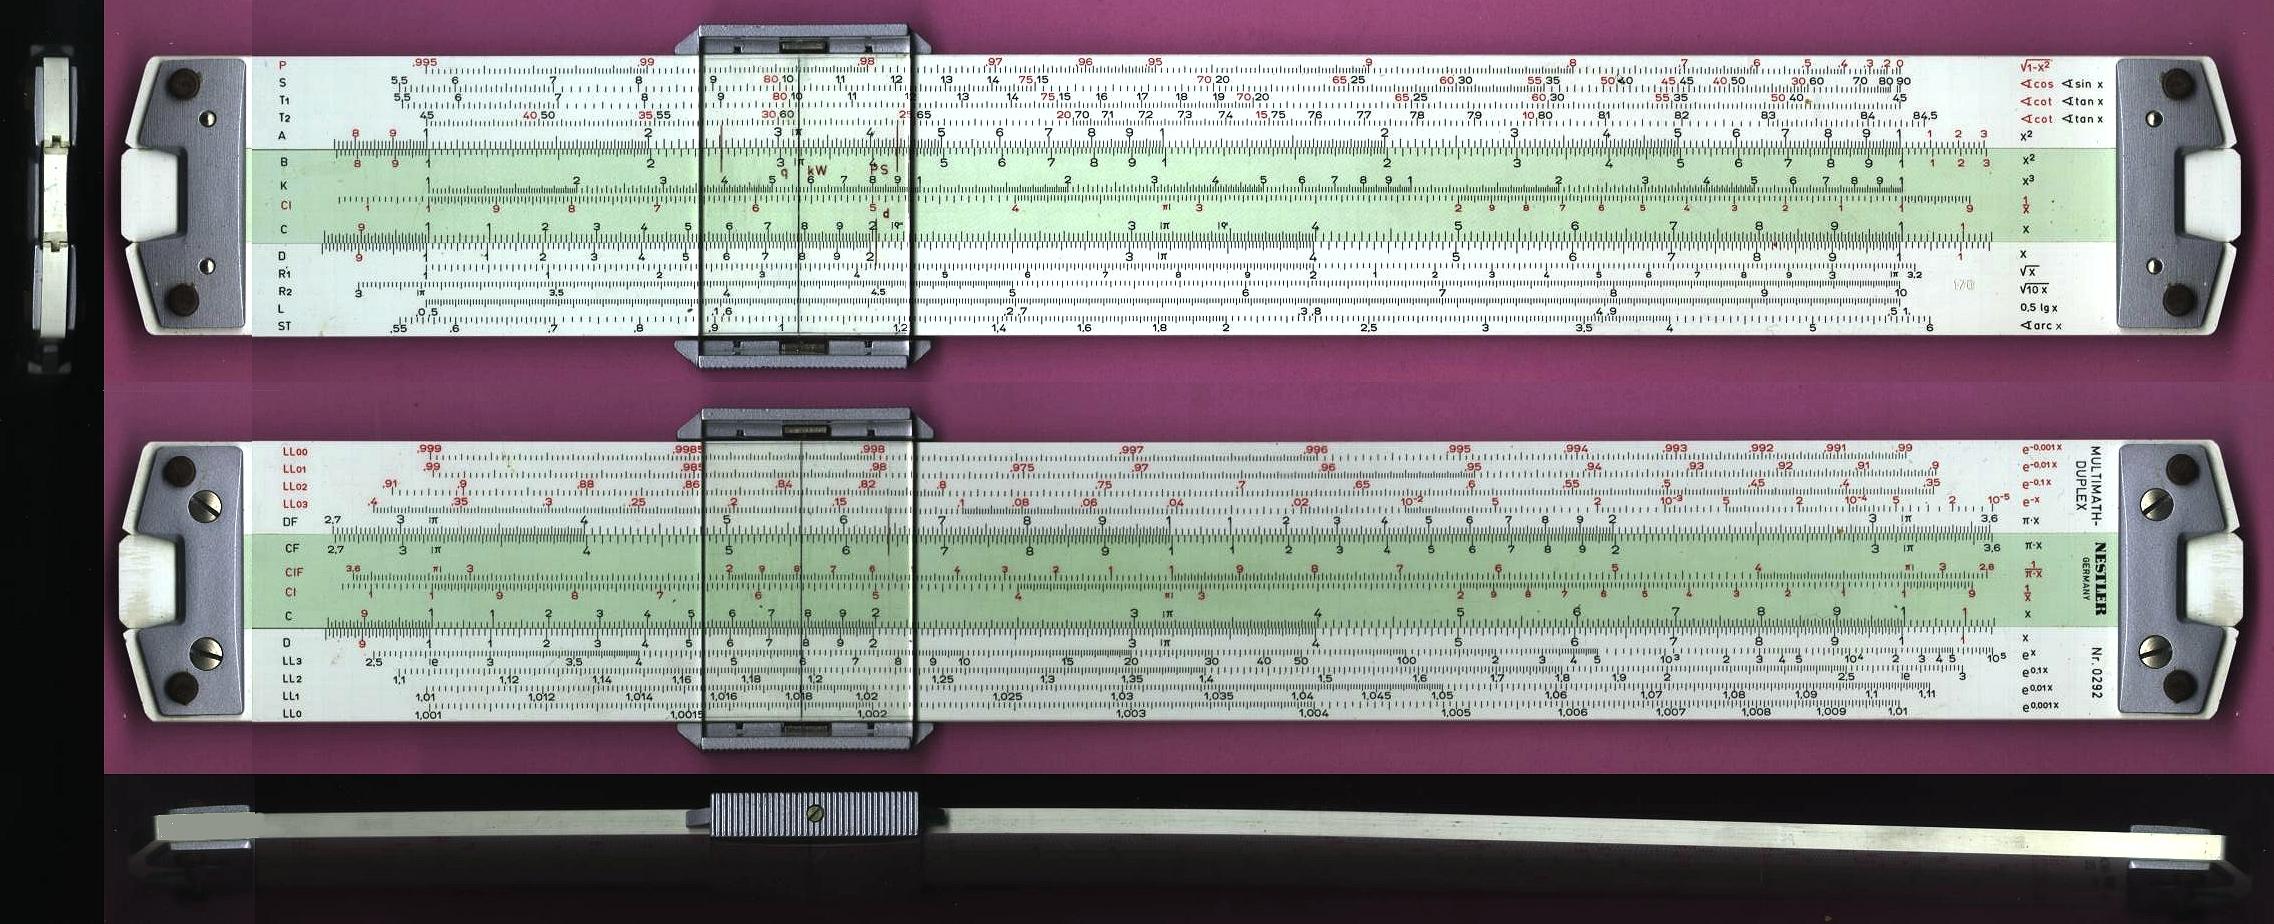 Nestler 0292 Multimath-Duplex Technical/Log-Log